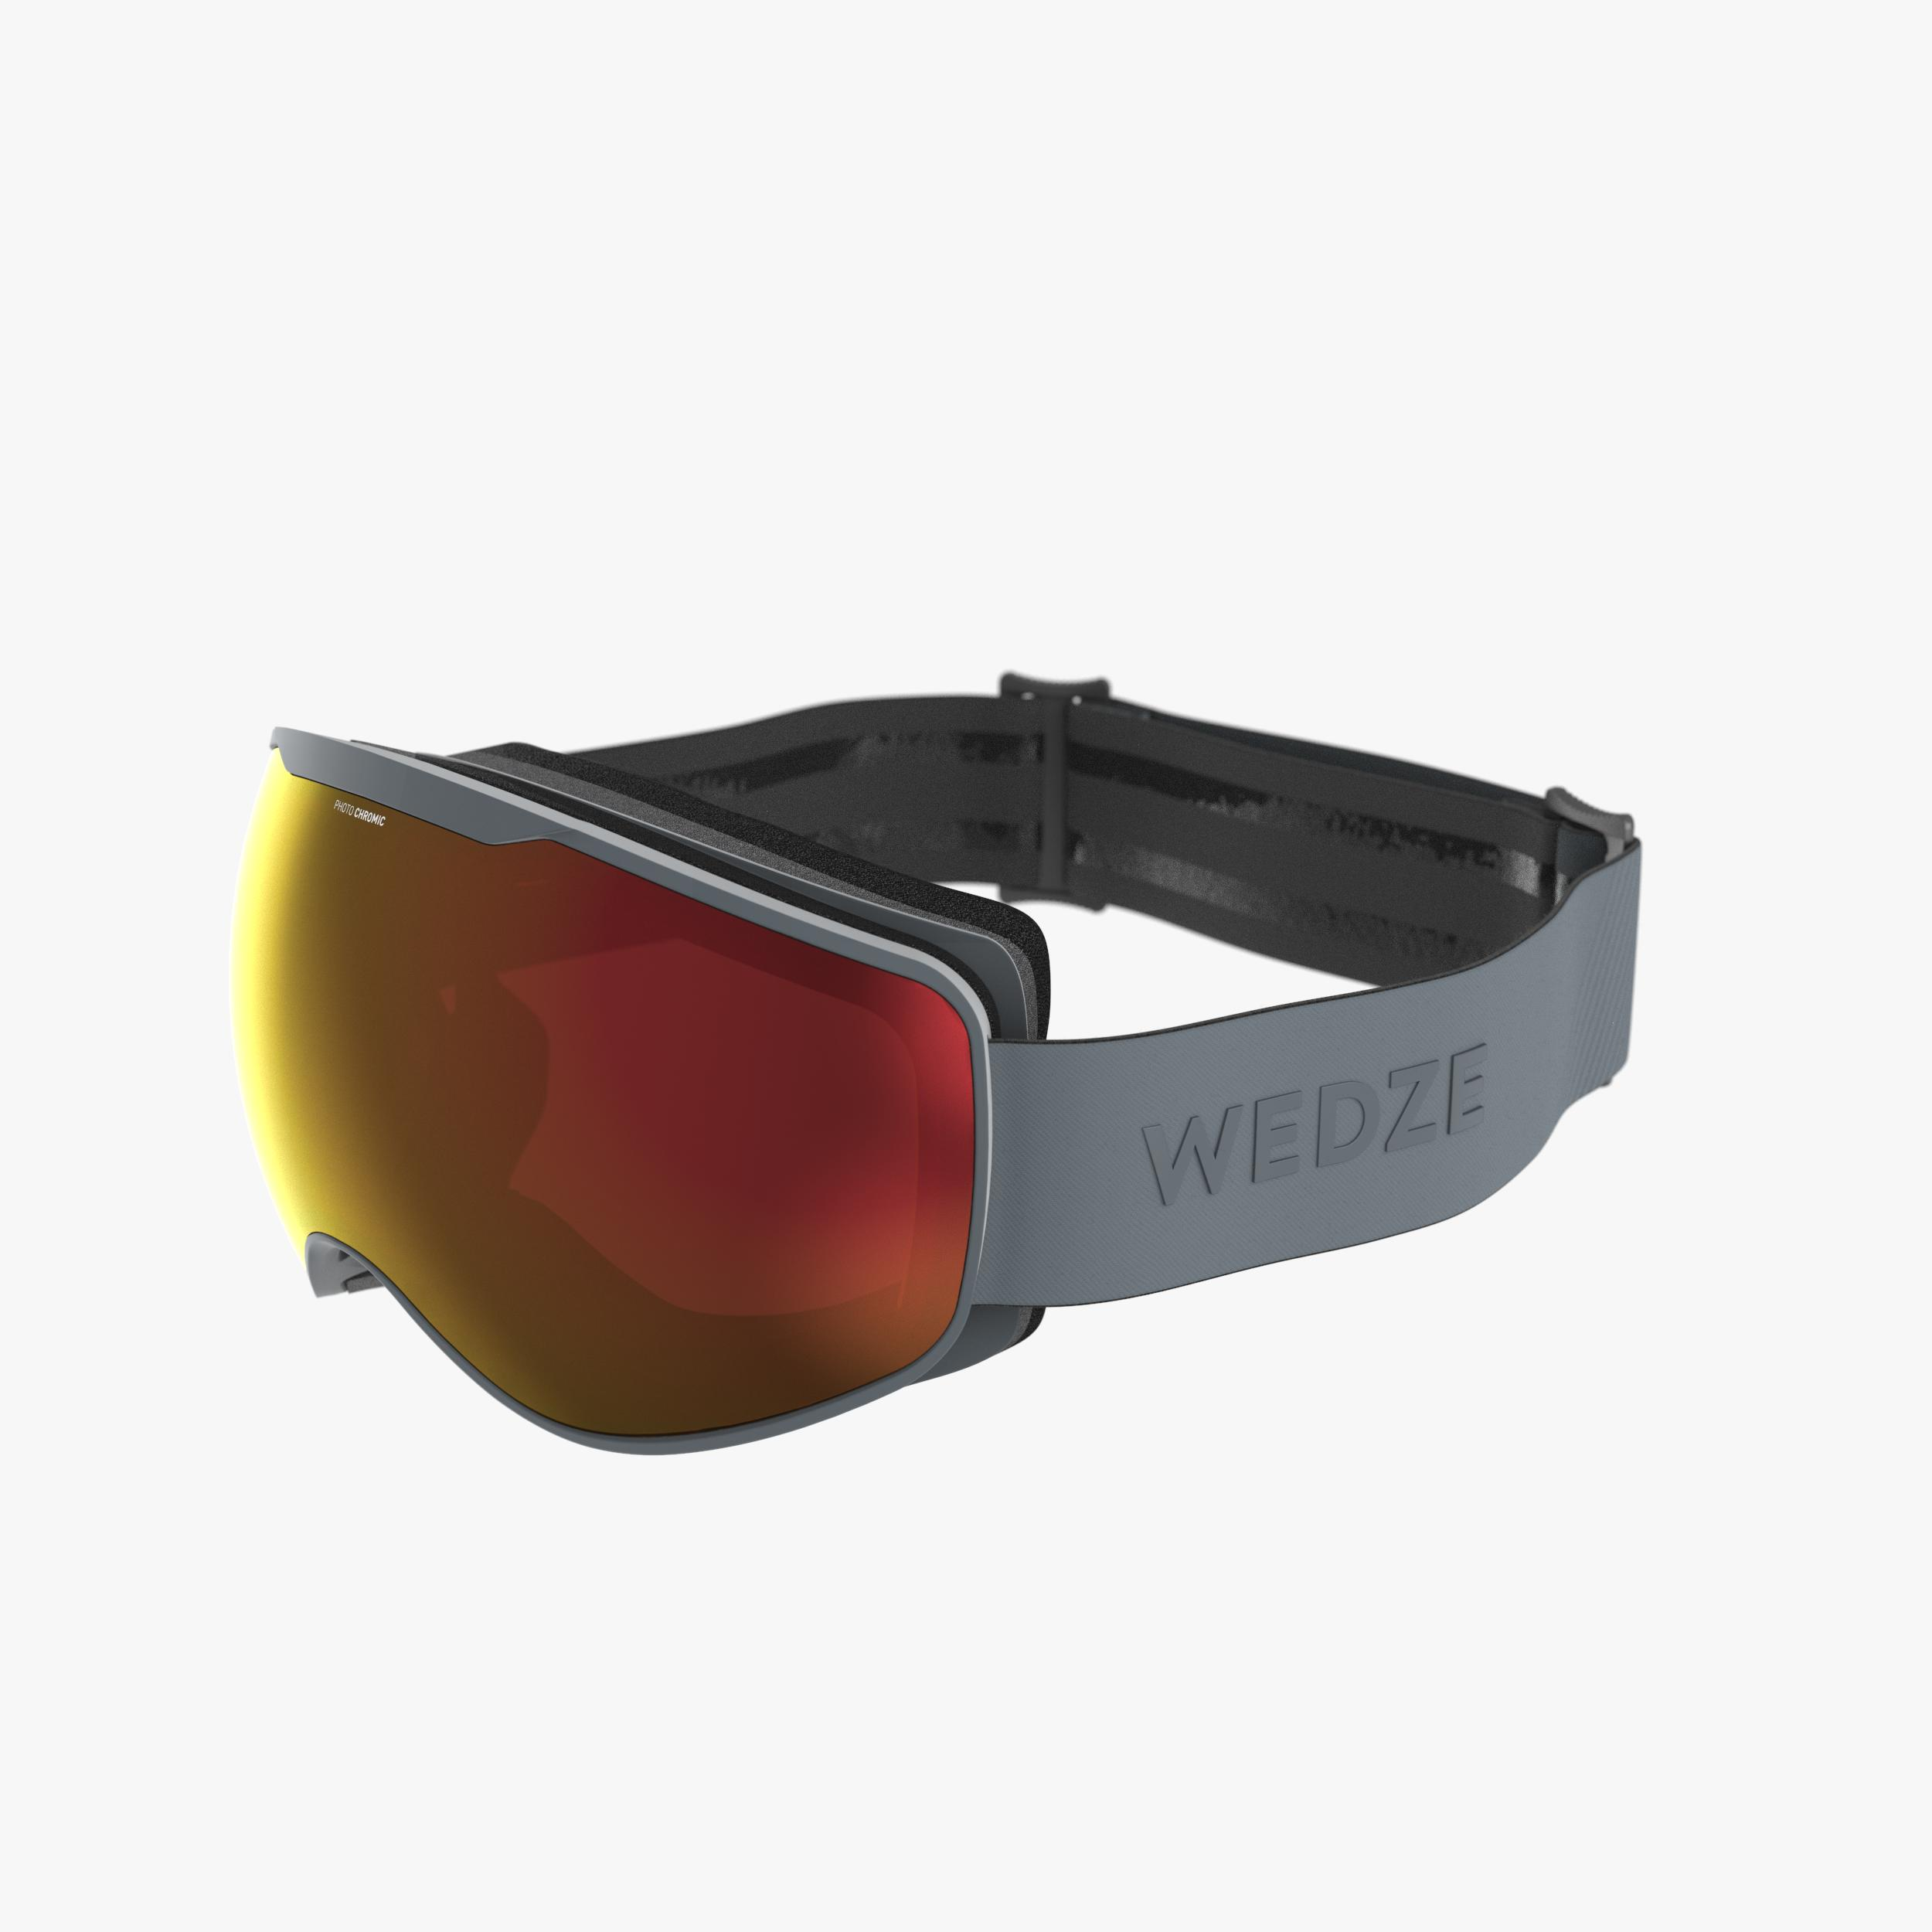 Ochelari schi G 900 PH imagine produs